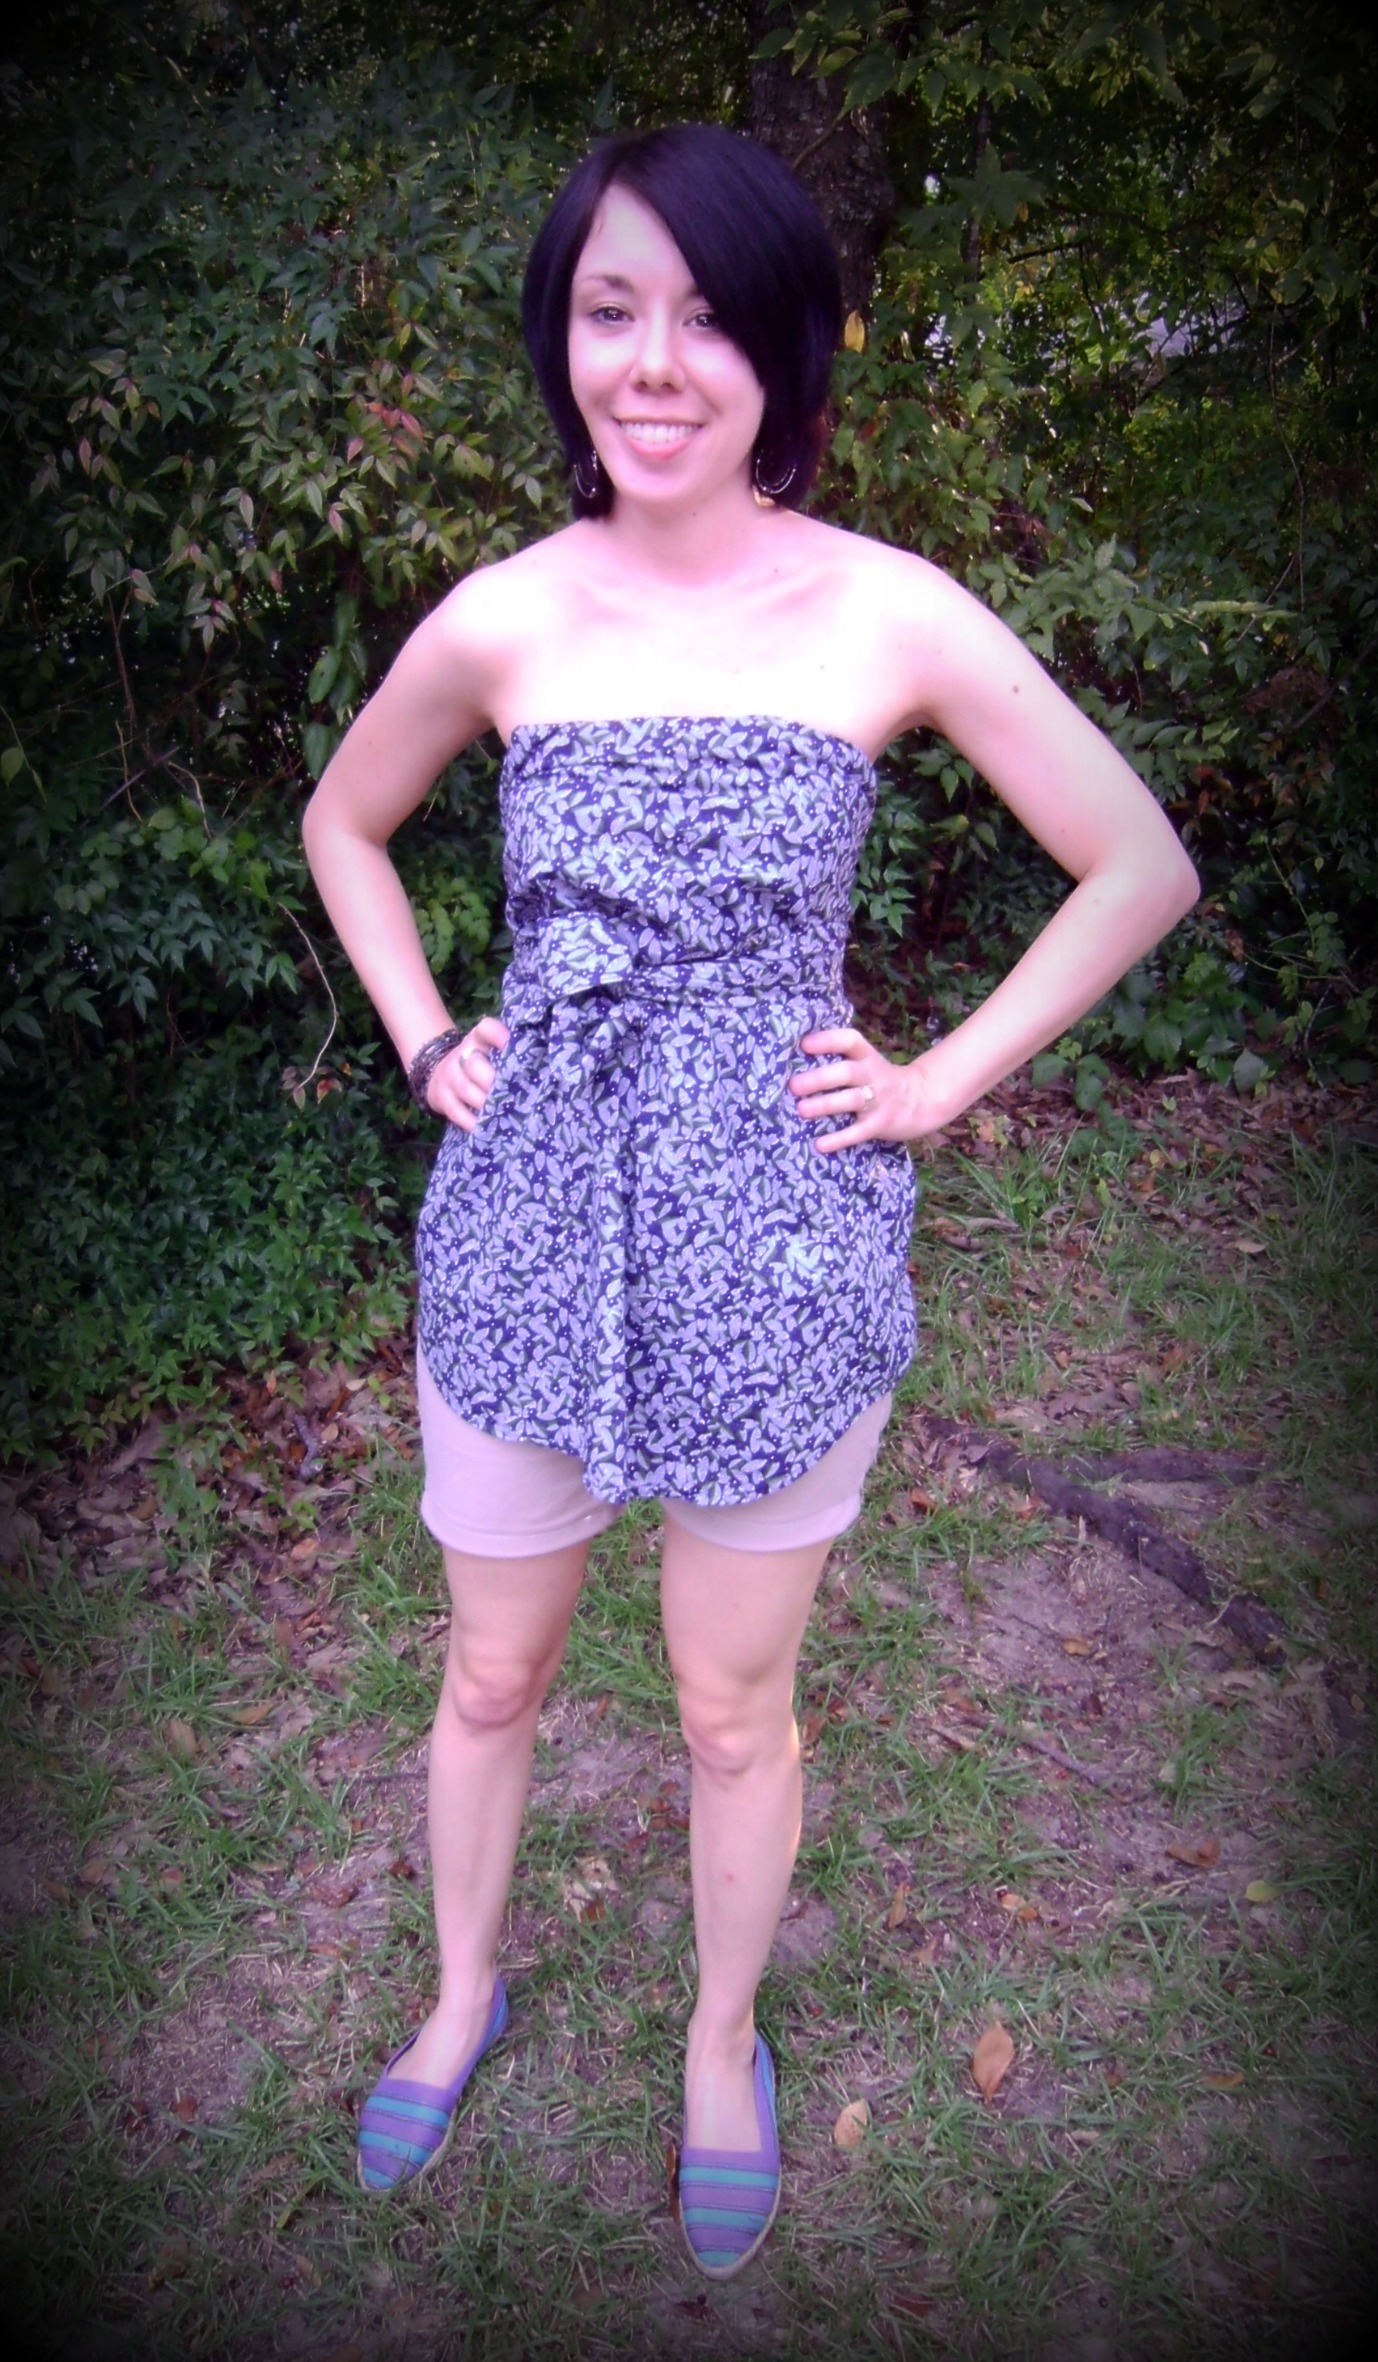 Day 43: Khaki Shorts & A No-Sew Top 8